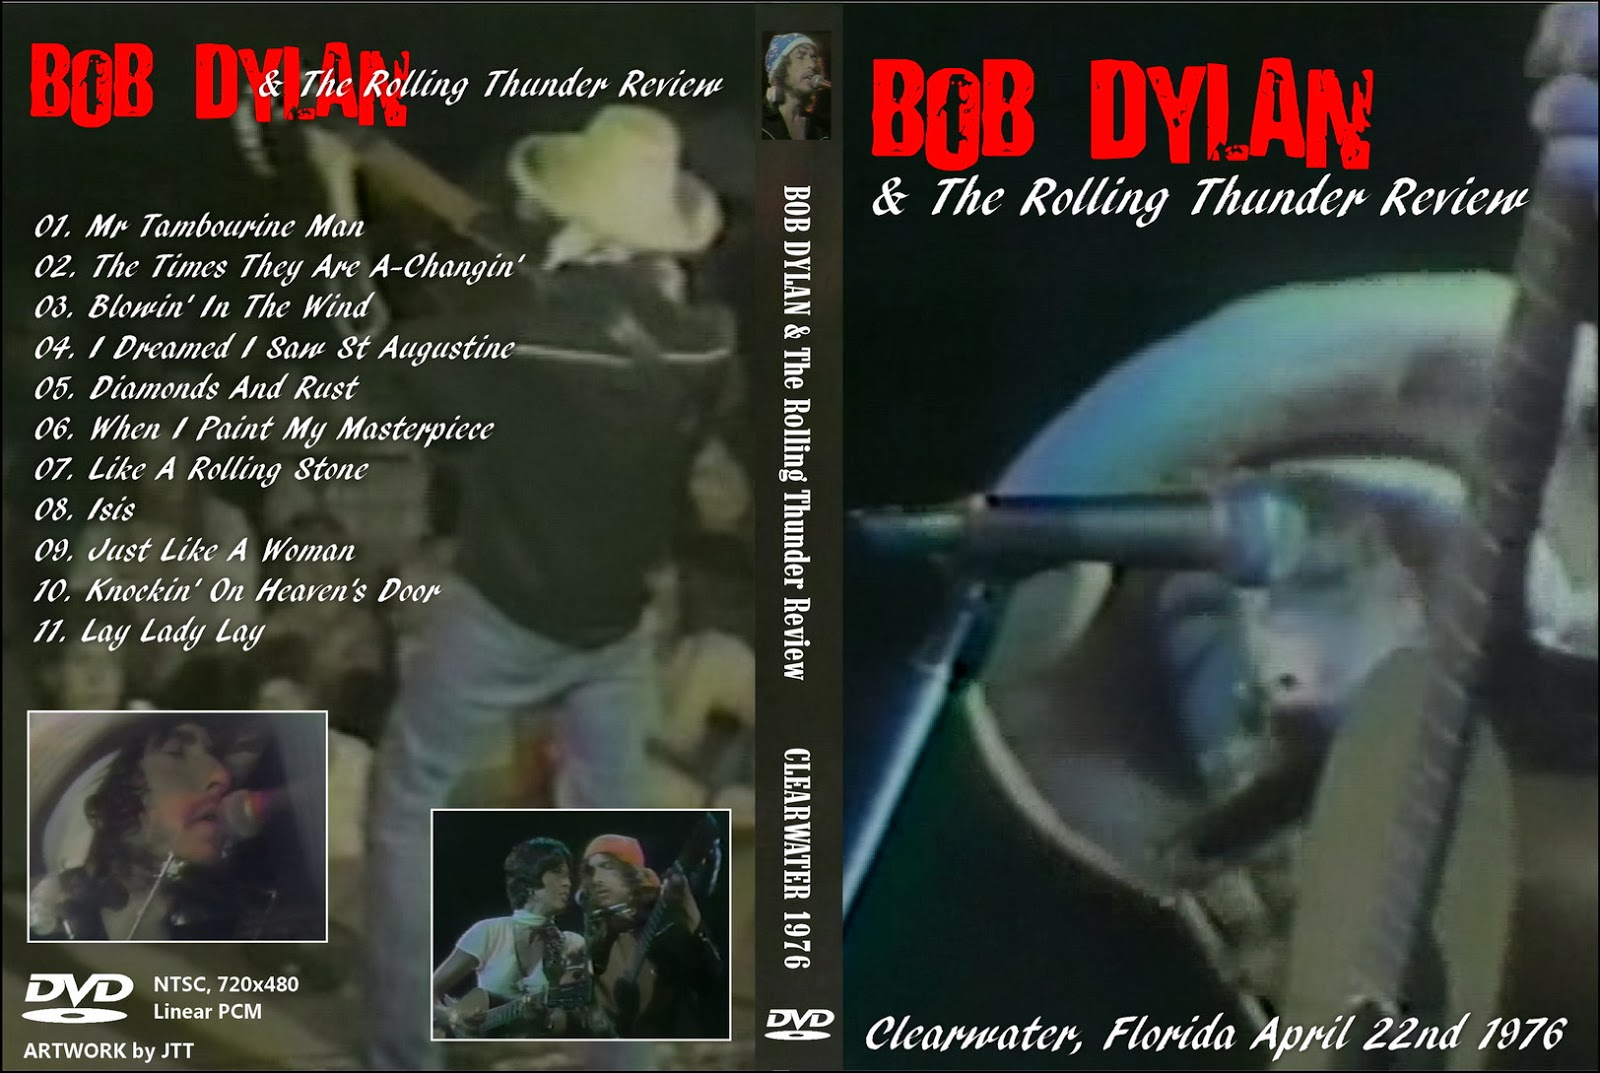 T.U.B.E.: Bob Dylan - 1976-04-22 - Clearwater, FL (DVDfull pro-shot)